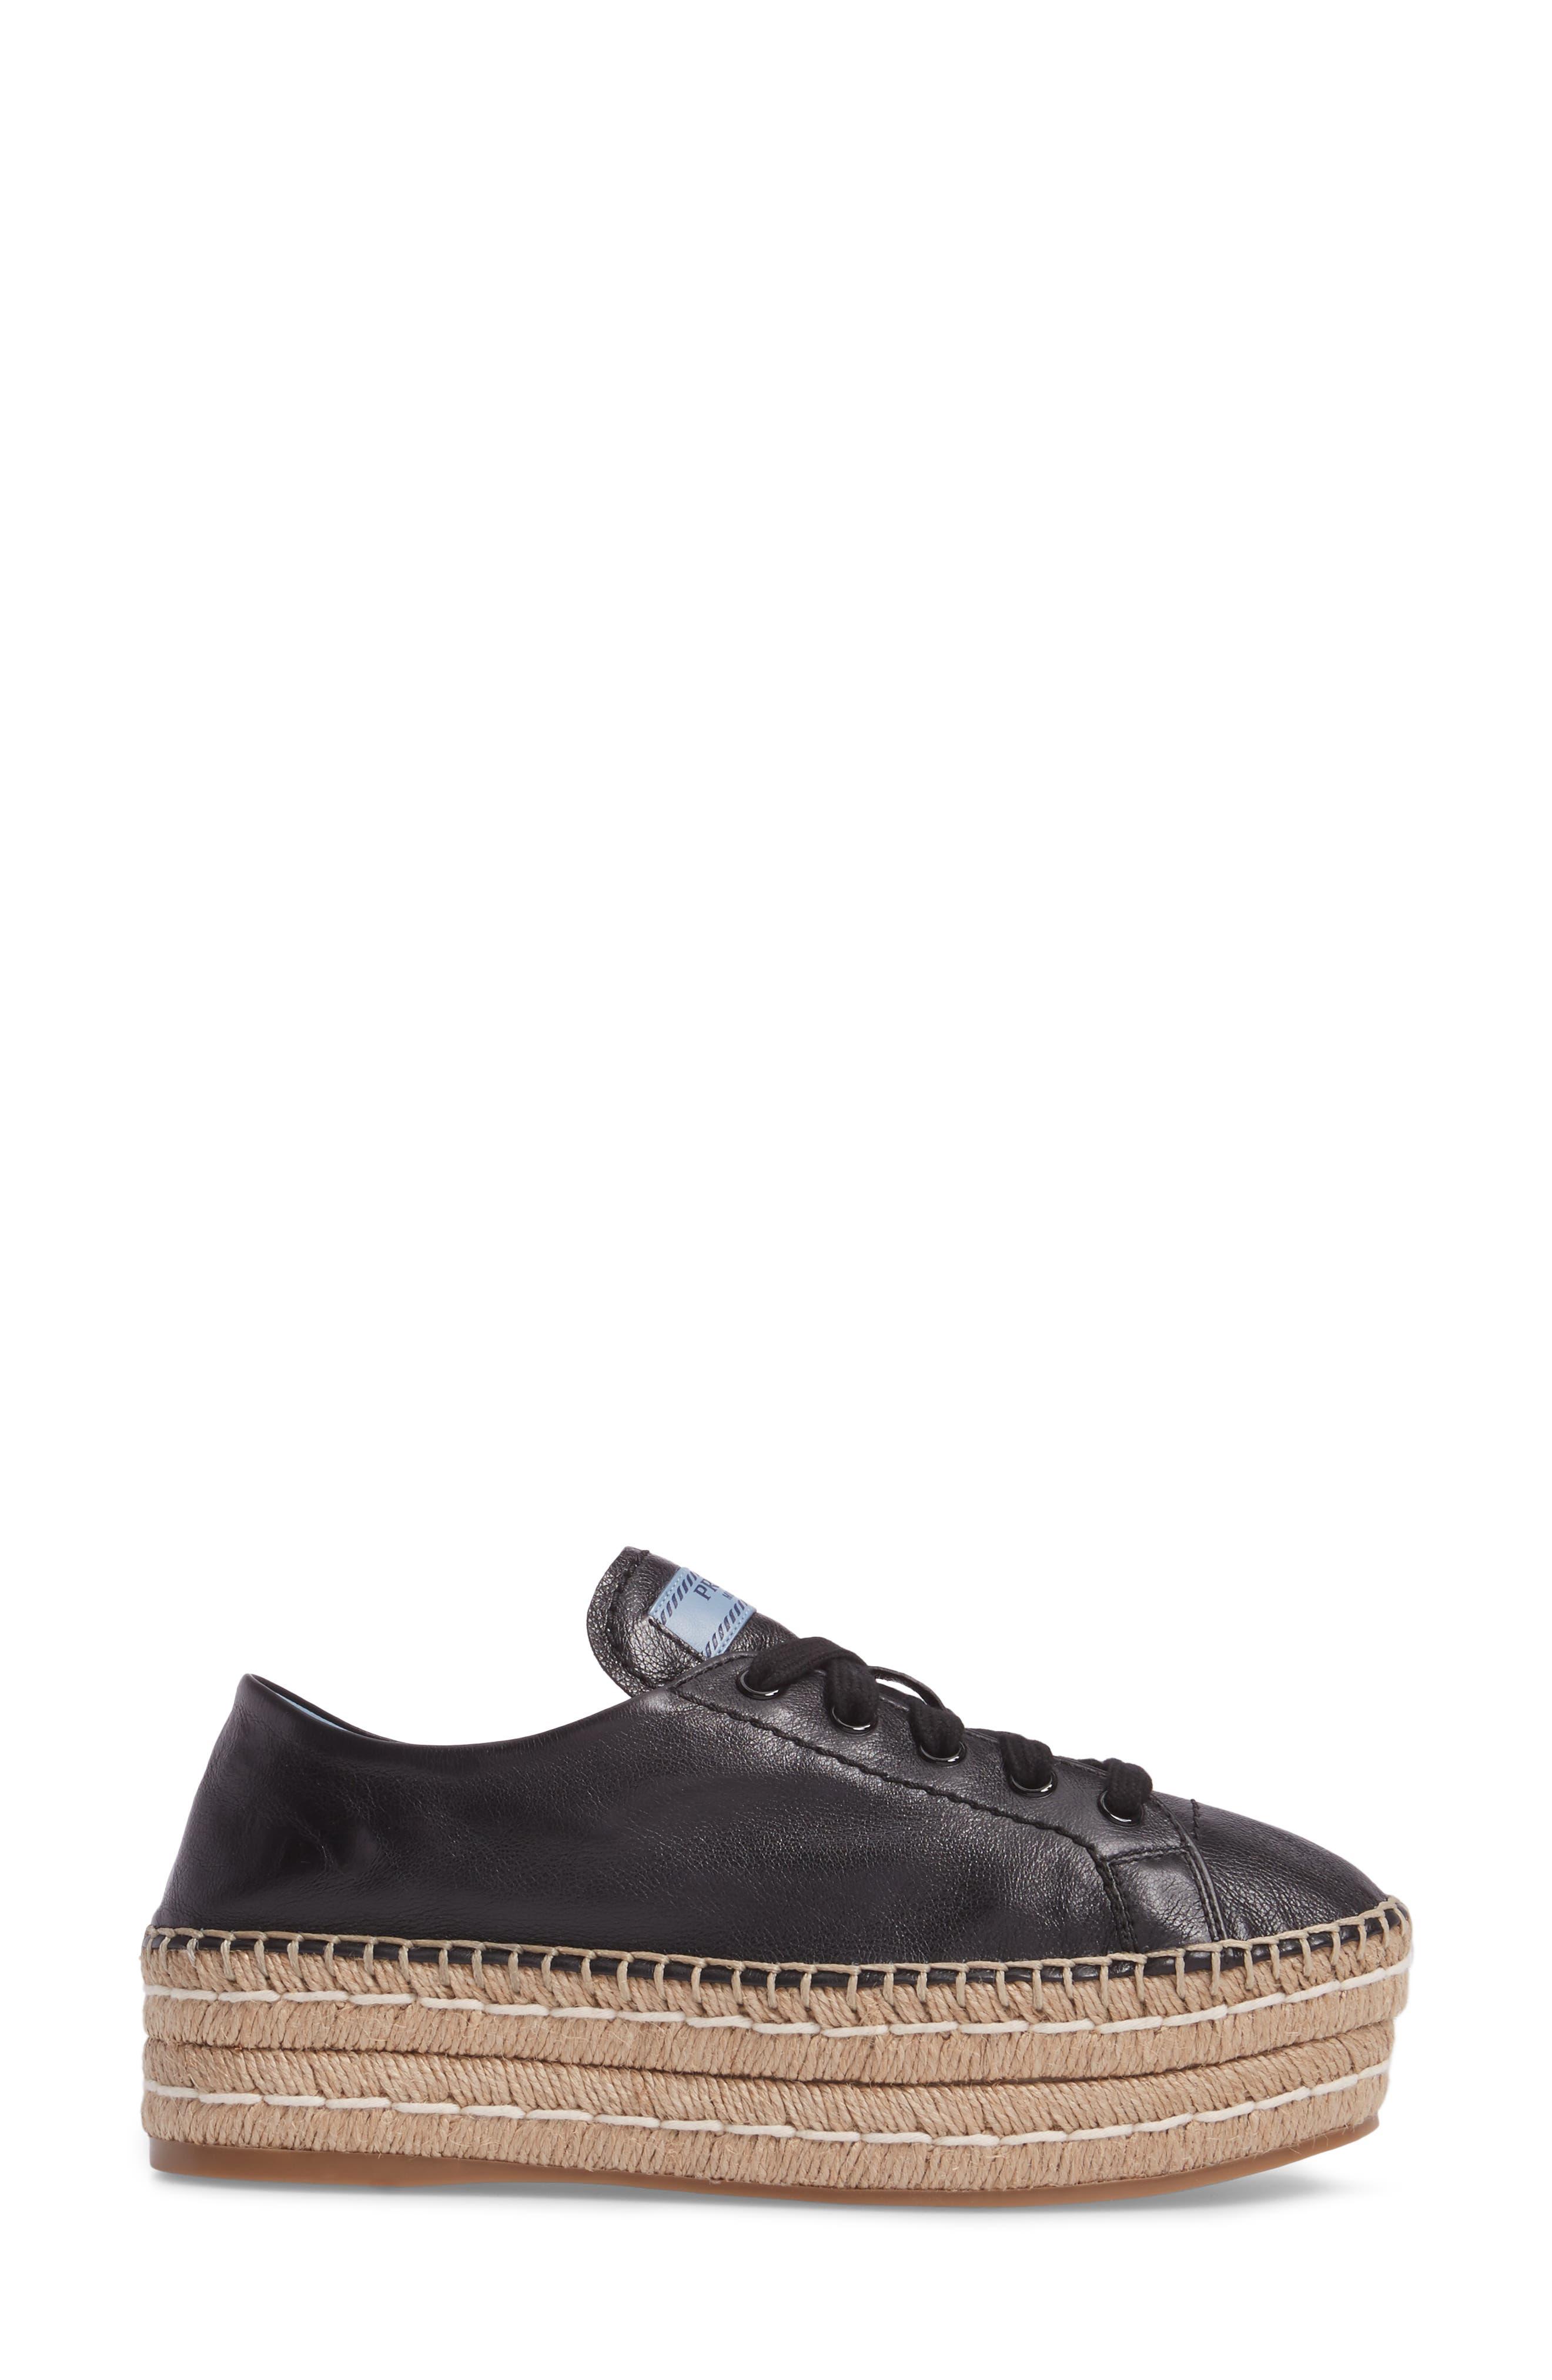 Flatform Espadrille Sneaker,                             Alternate thumbnail 3, color,                             Black